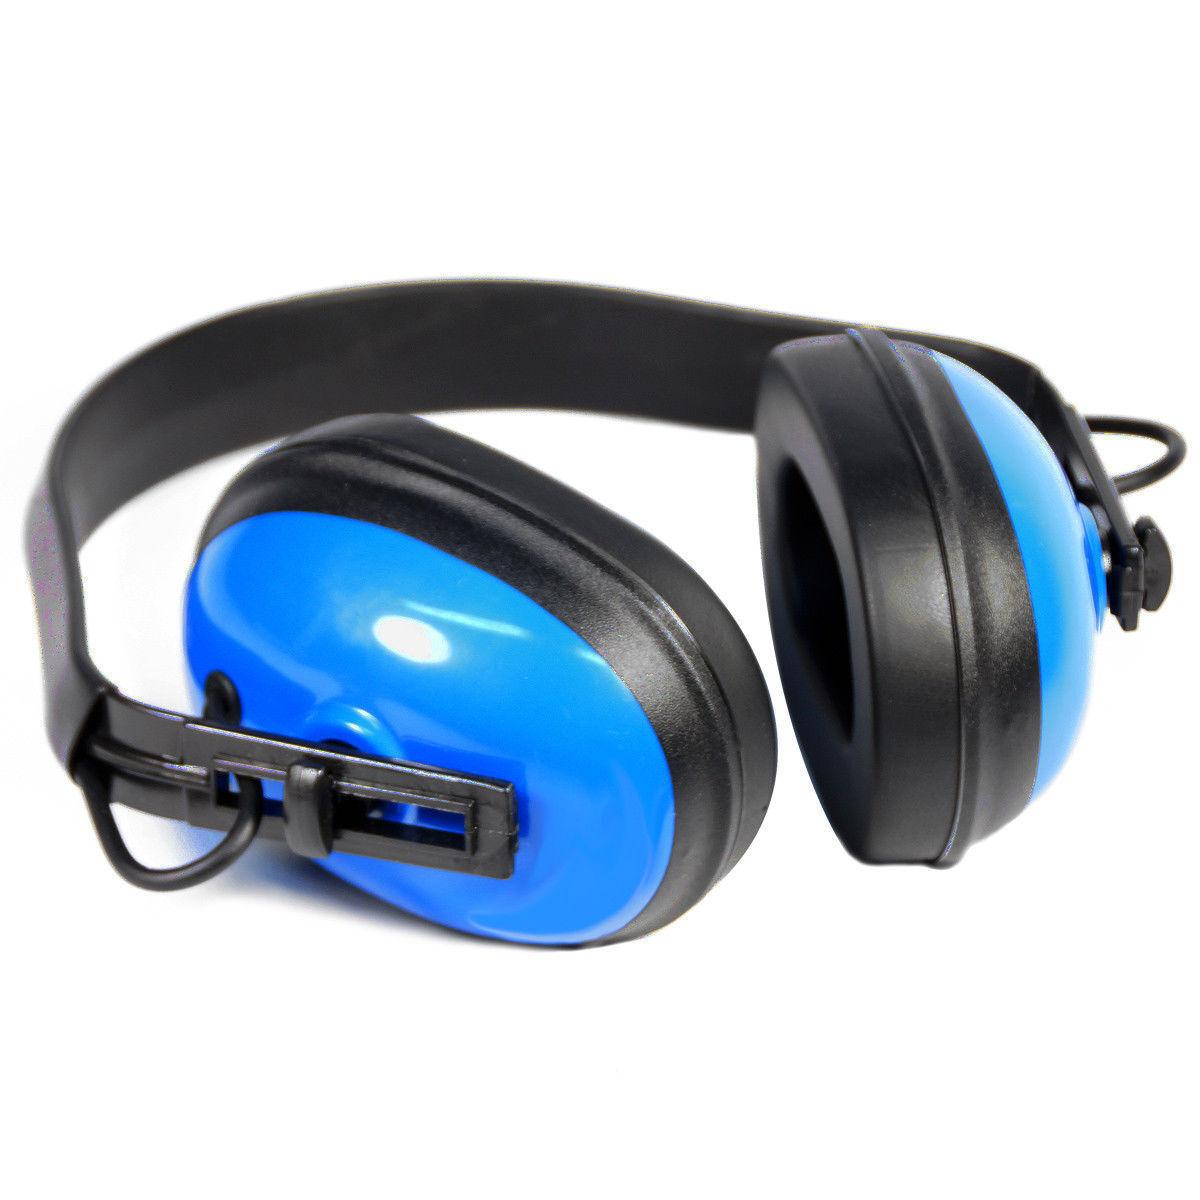 Garrett Submersible Headphones for AT Gold, AT Pro, Infinum LS, ATX 2202100